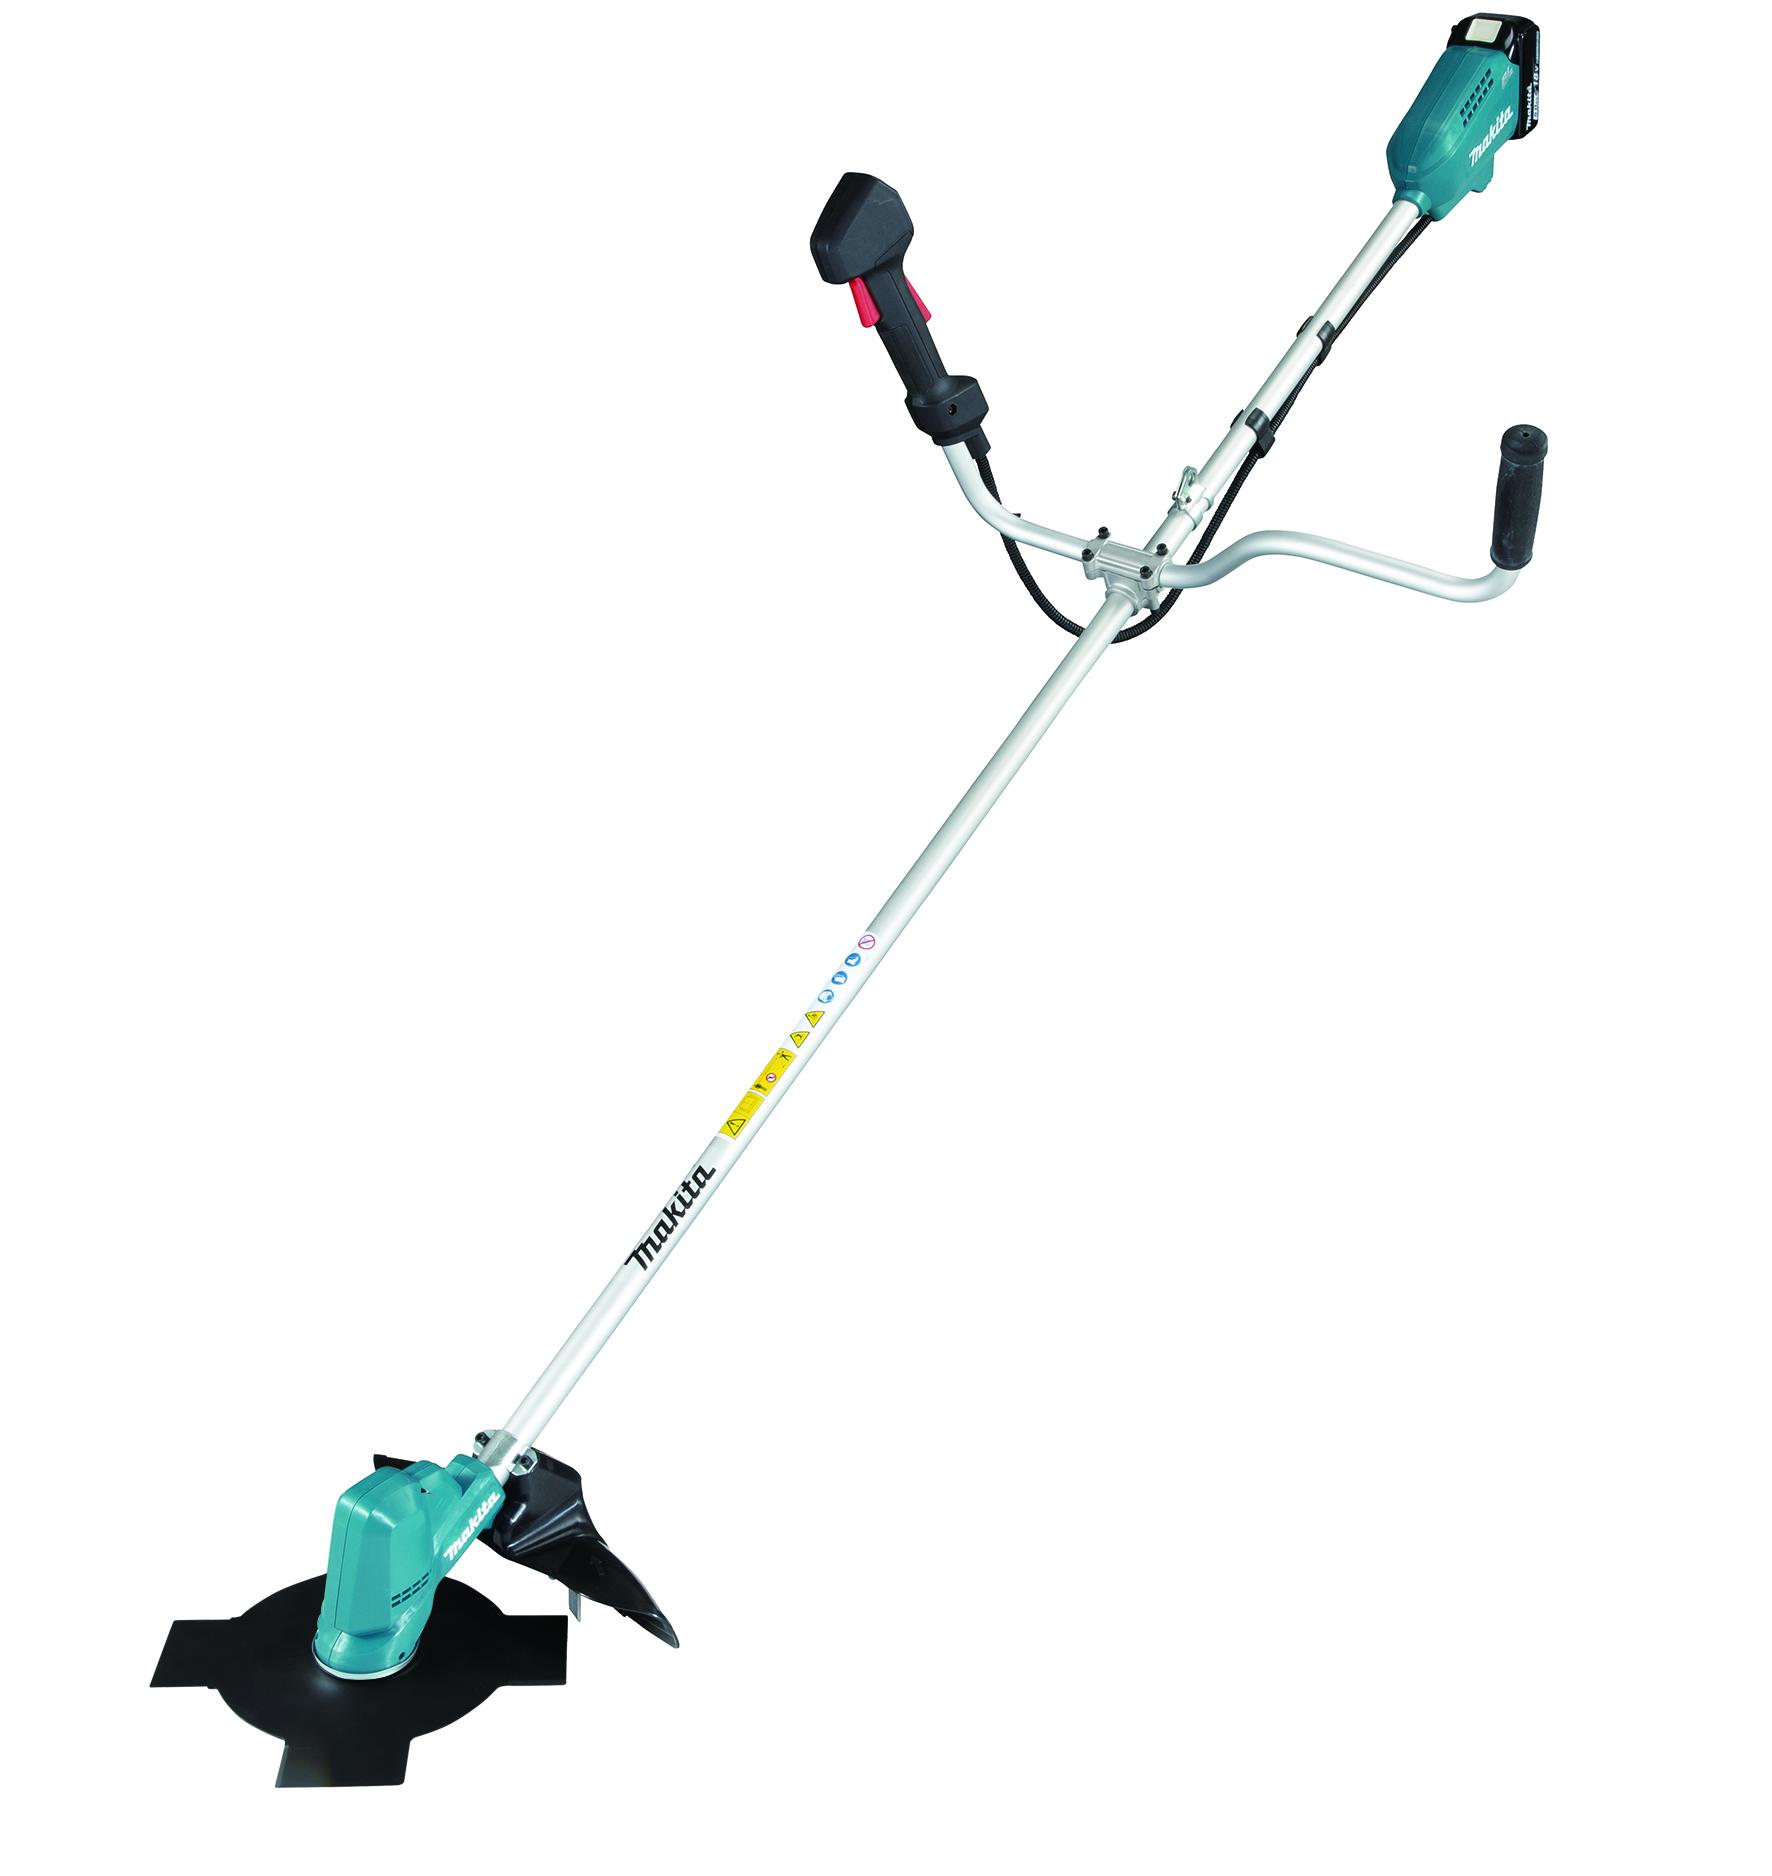 Máy cắt cỏ dùng pin (BL) (18V) DUR190UZX1